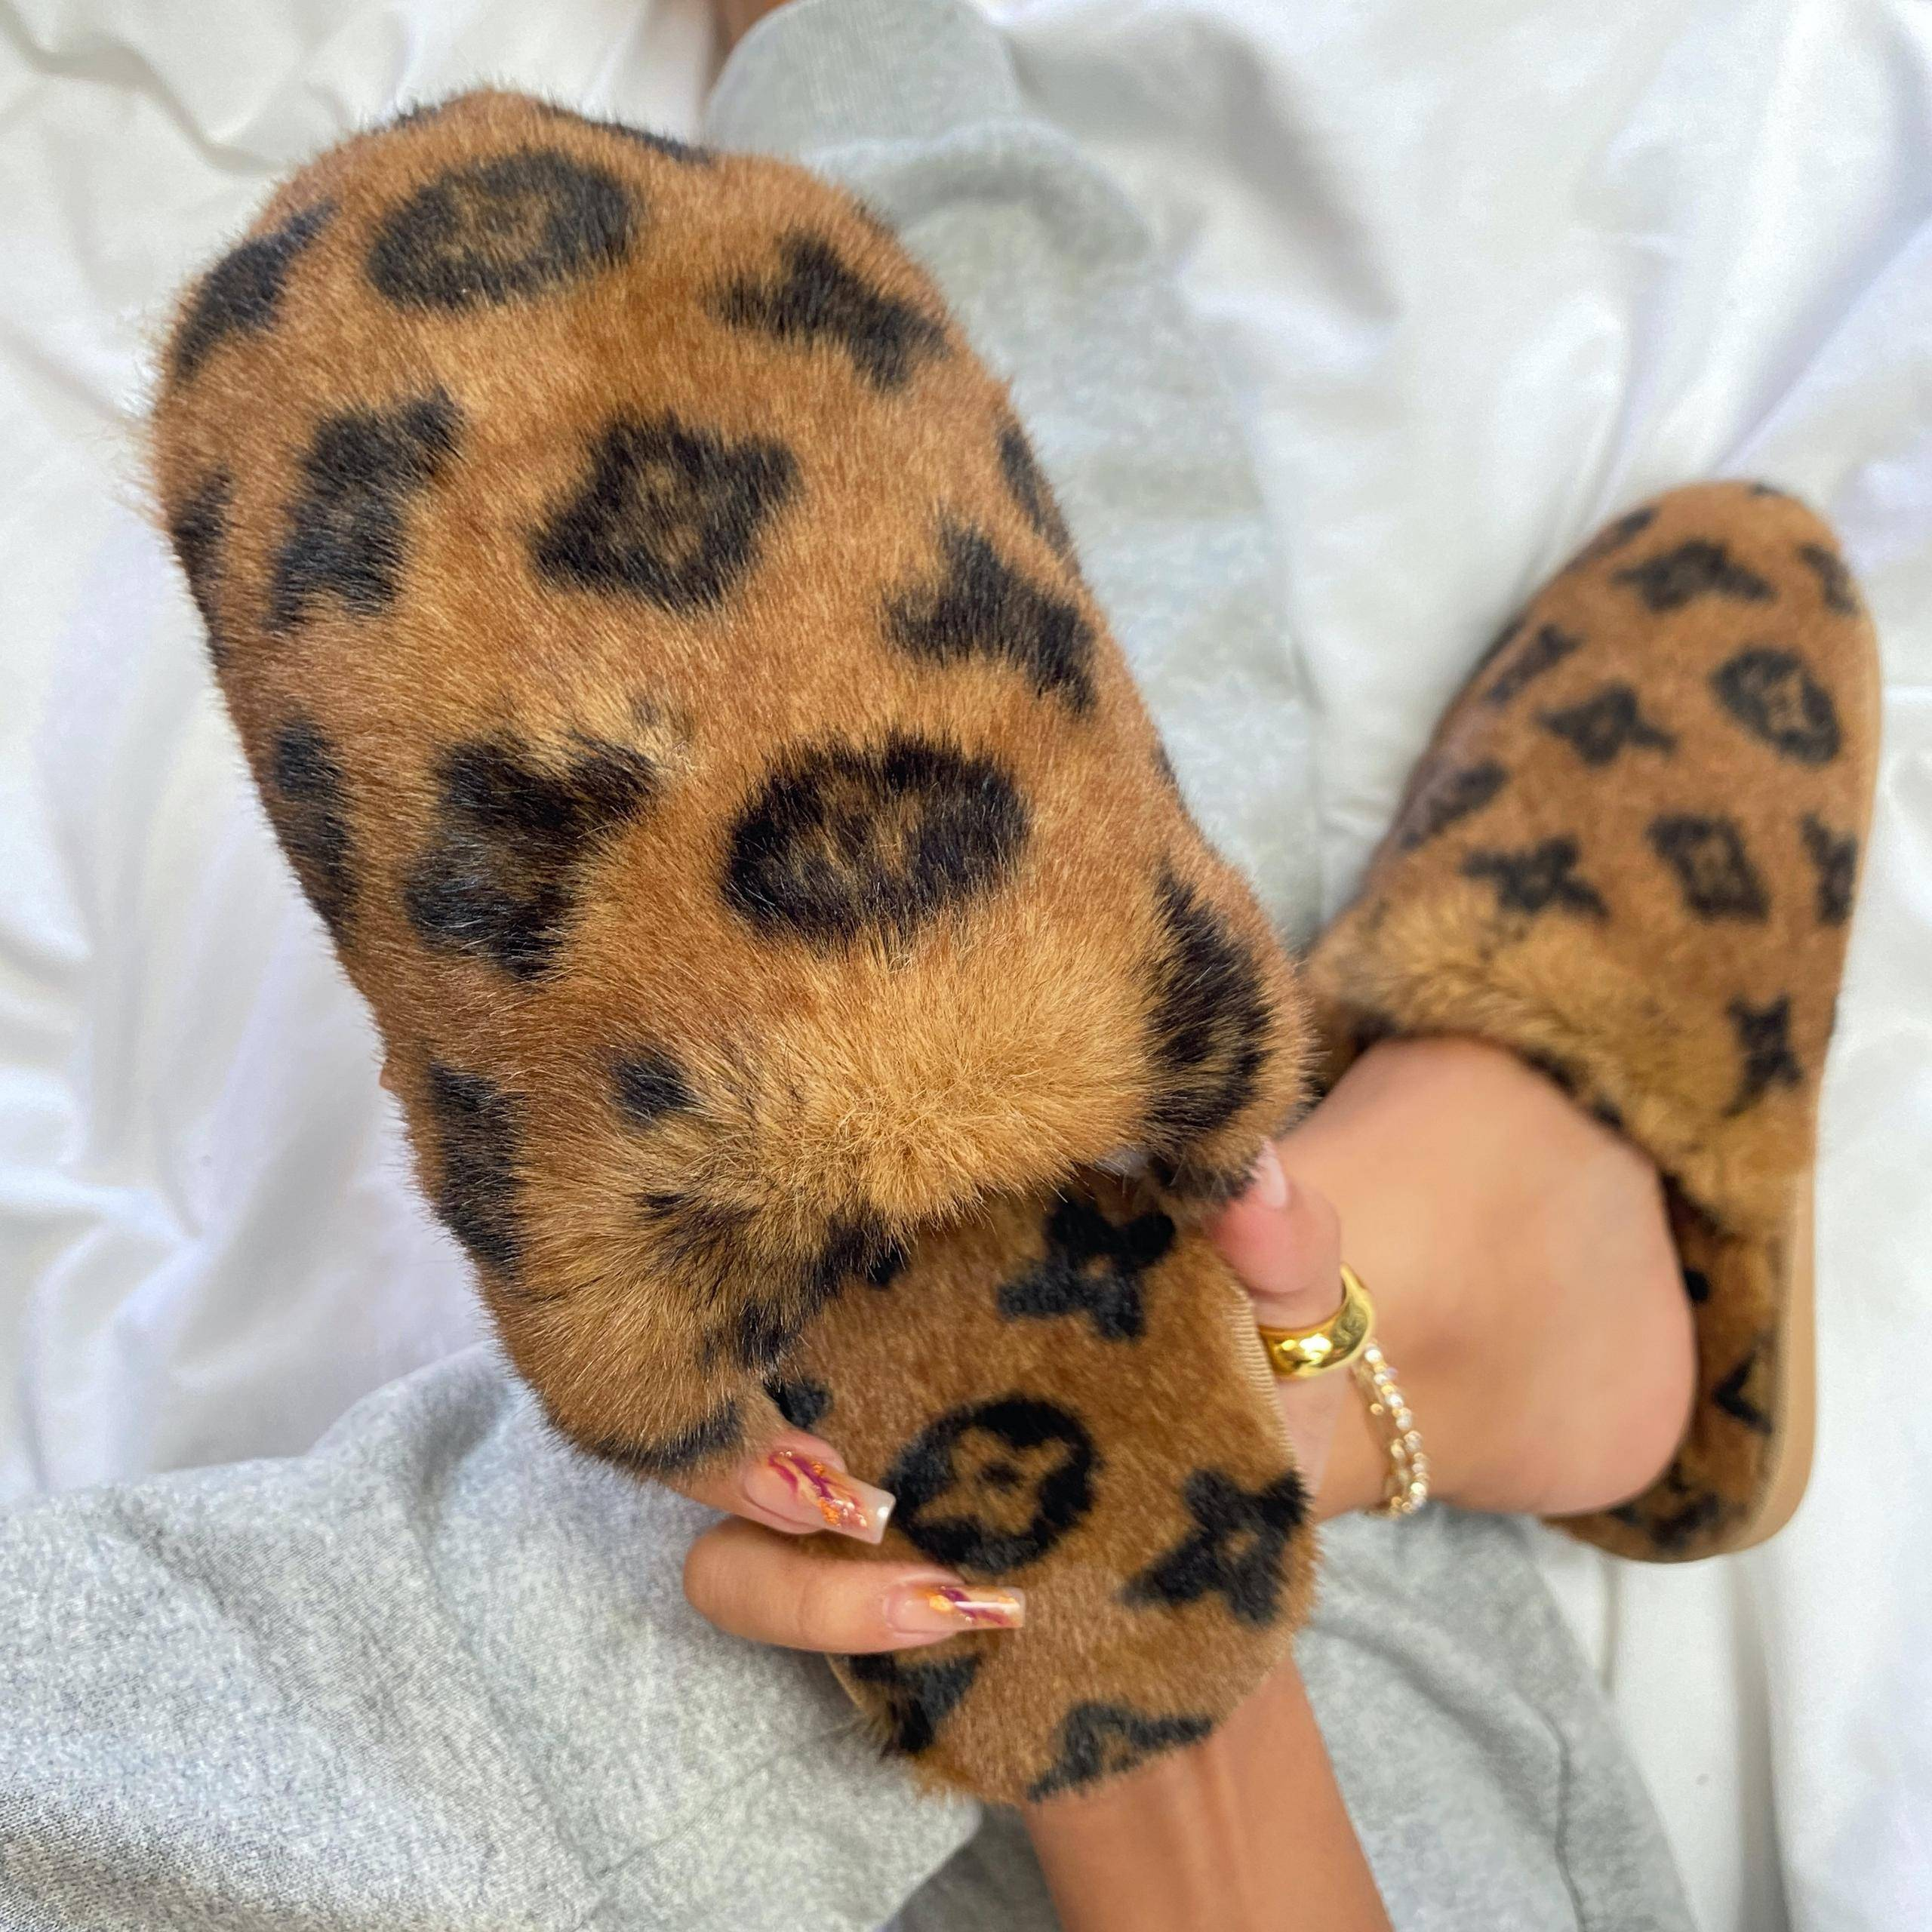 EGO Kulture Fluffy Printed Detail Flat Slipper In Tan Brown Faux Fur, Brown  - female - Size: 11